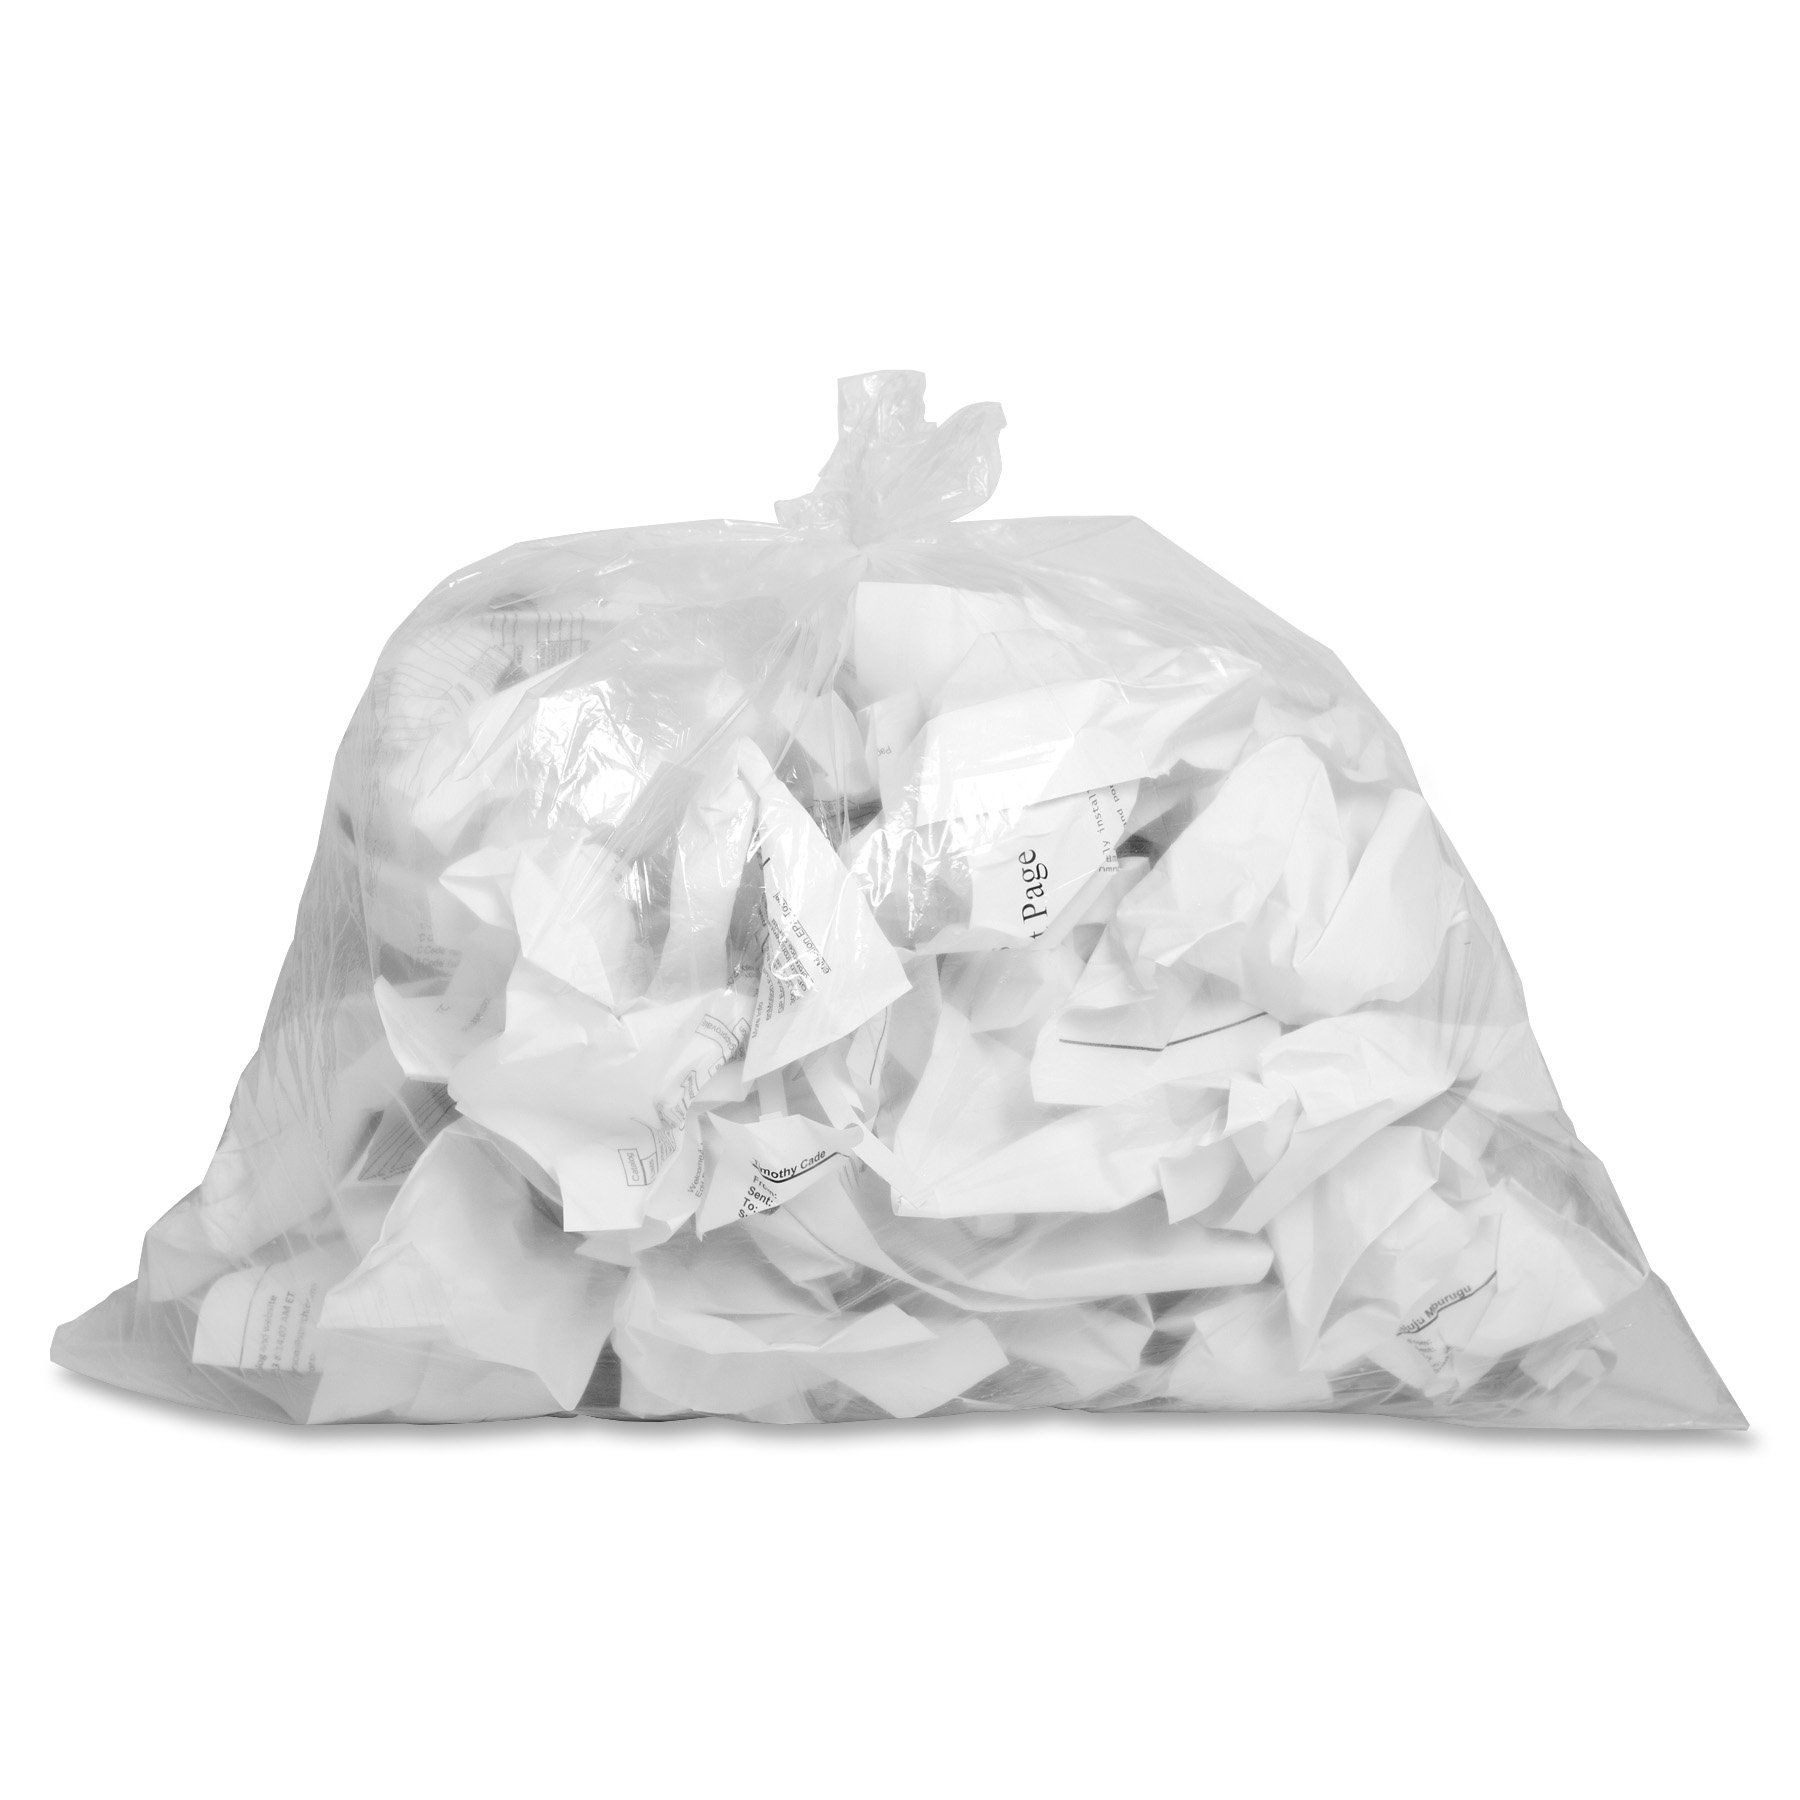 Genuine Joe GJO01010 Low-Density Trash Can Liner, 10 Gallon Capacity, 24'' Length x 23'' Width x 0.60 mil Thickness, Clear (Box of 500) by Genuine Joe